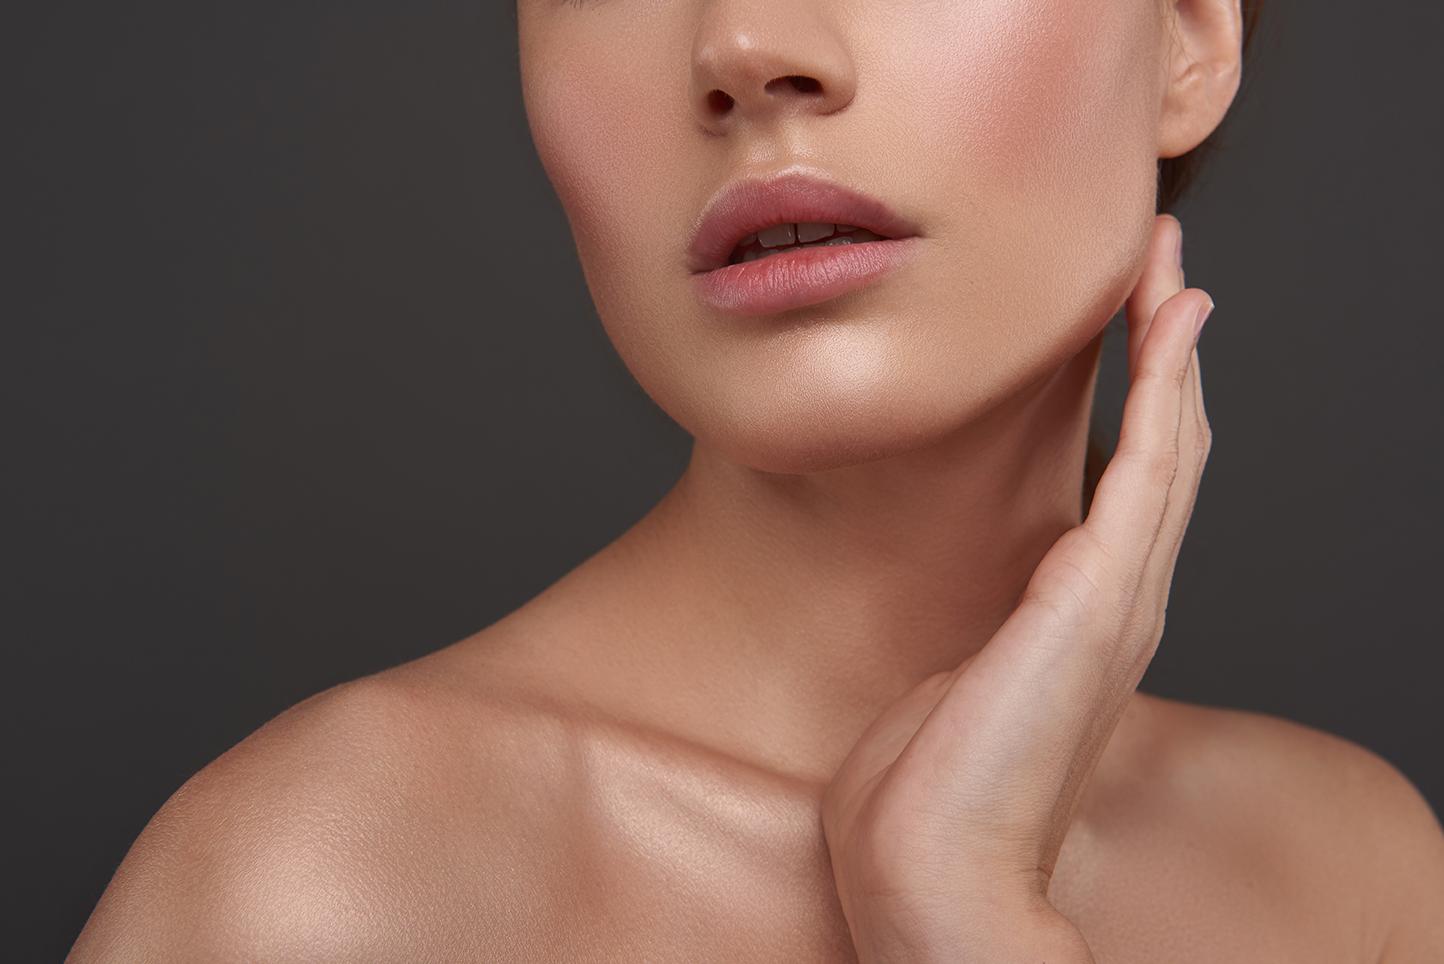 Chirurgie des glandes salivaires